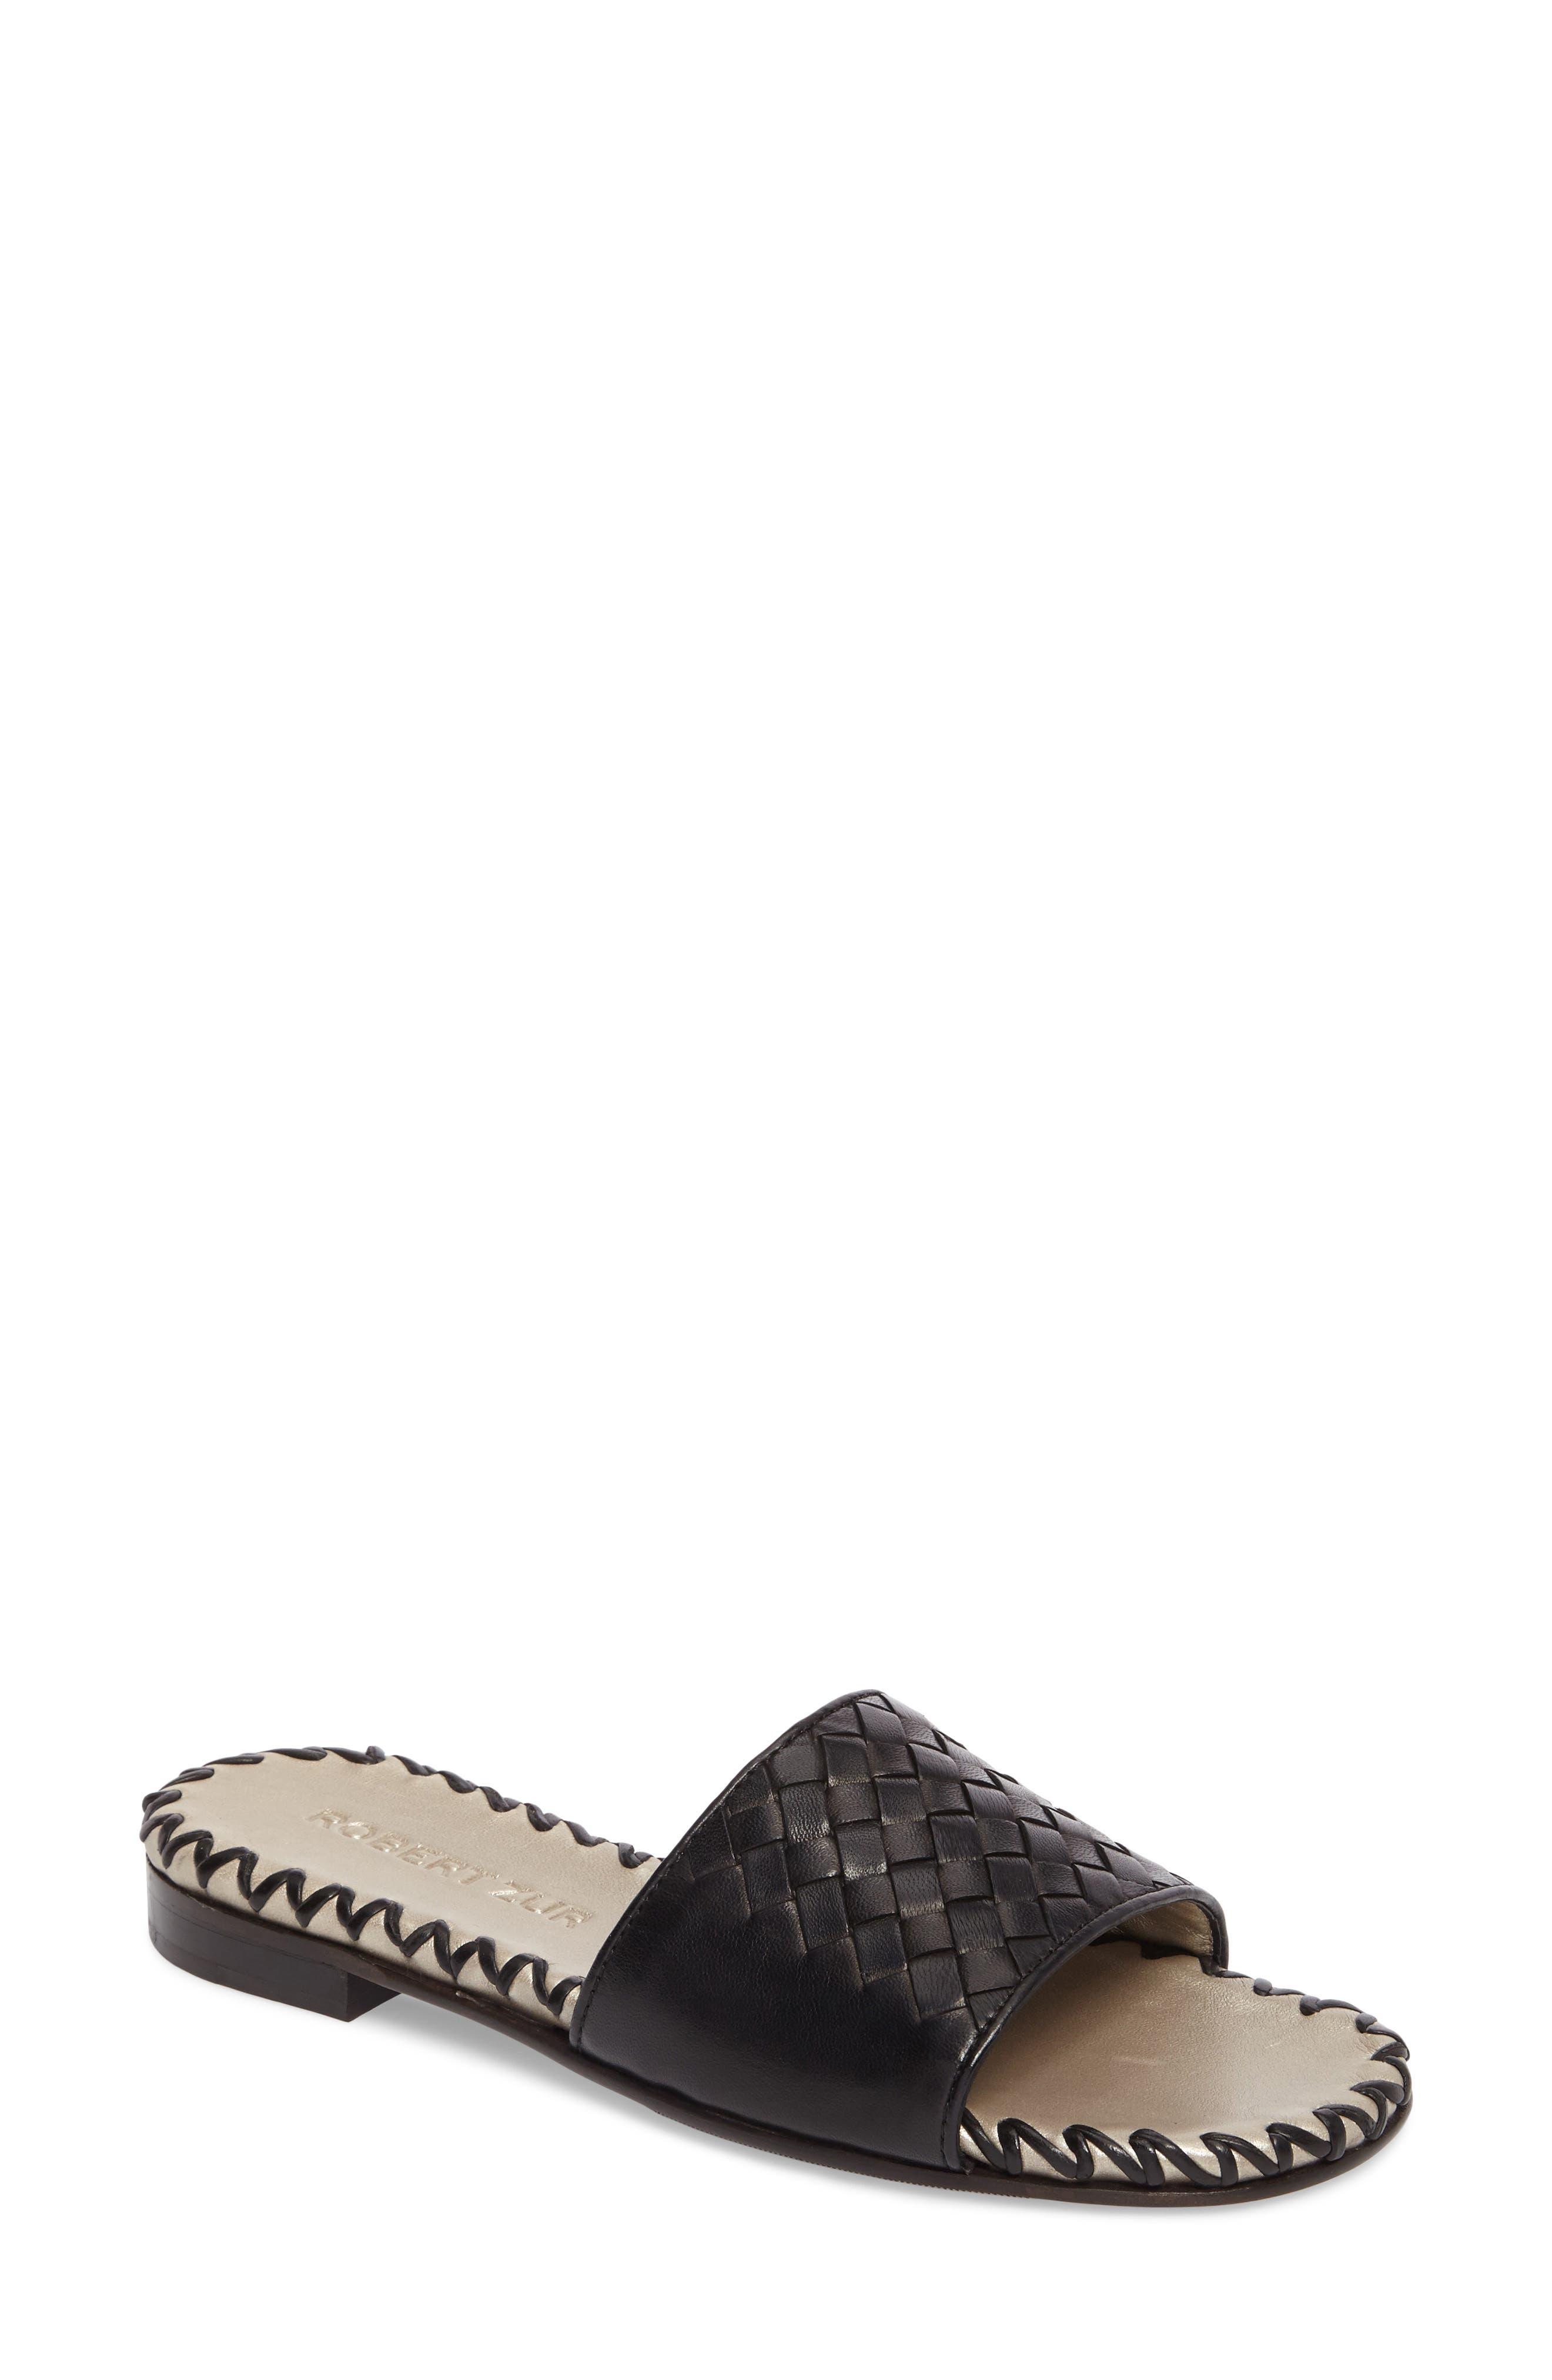 Matilda Woven Slide Sandal,                         Main,                         color, 001